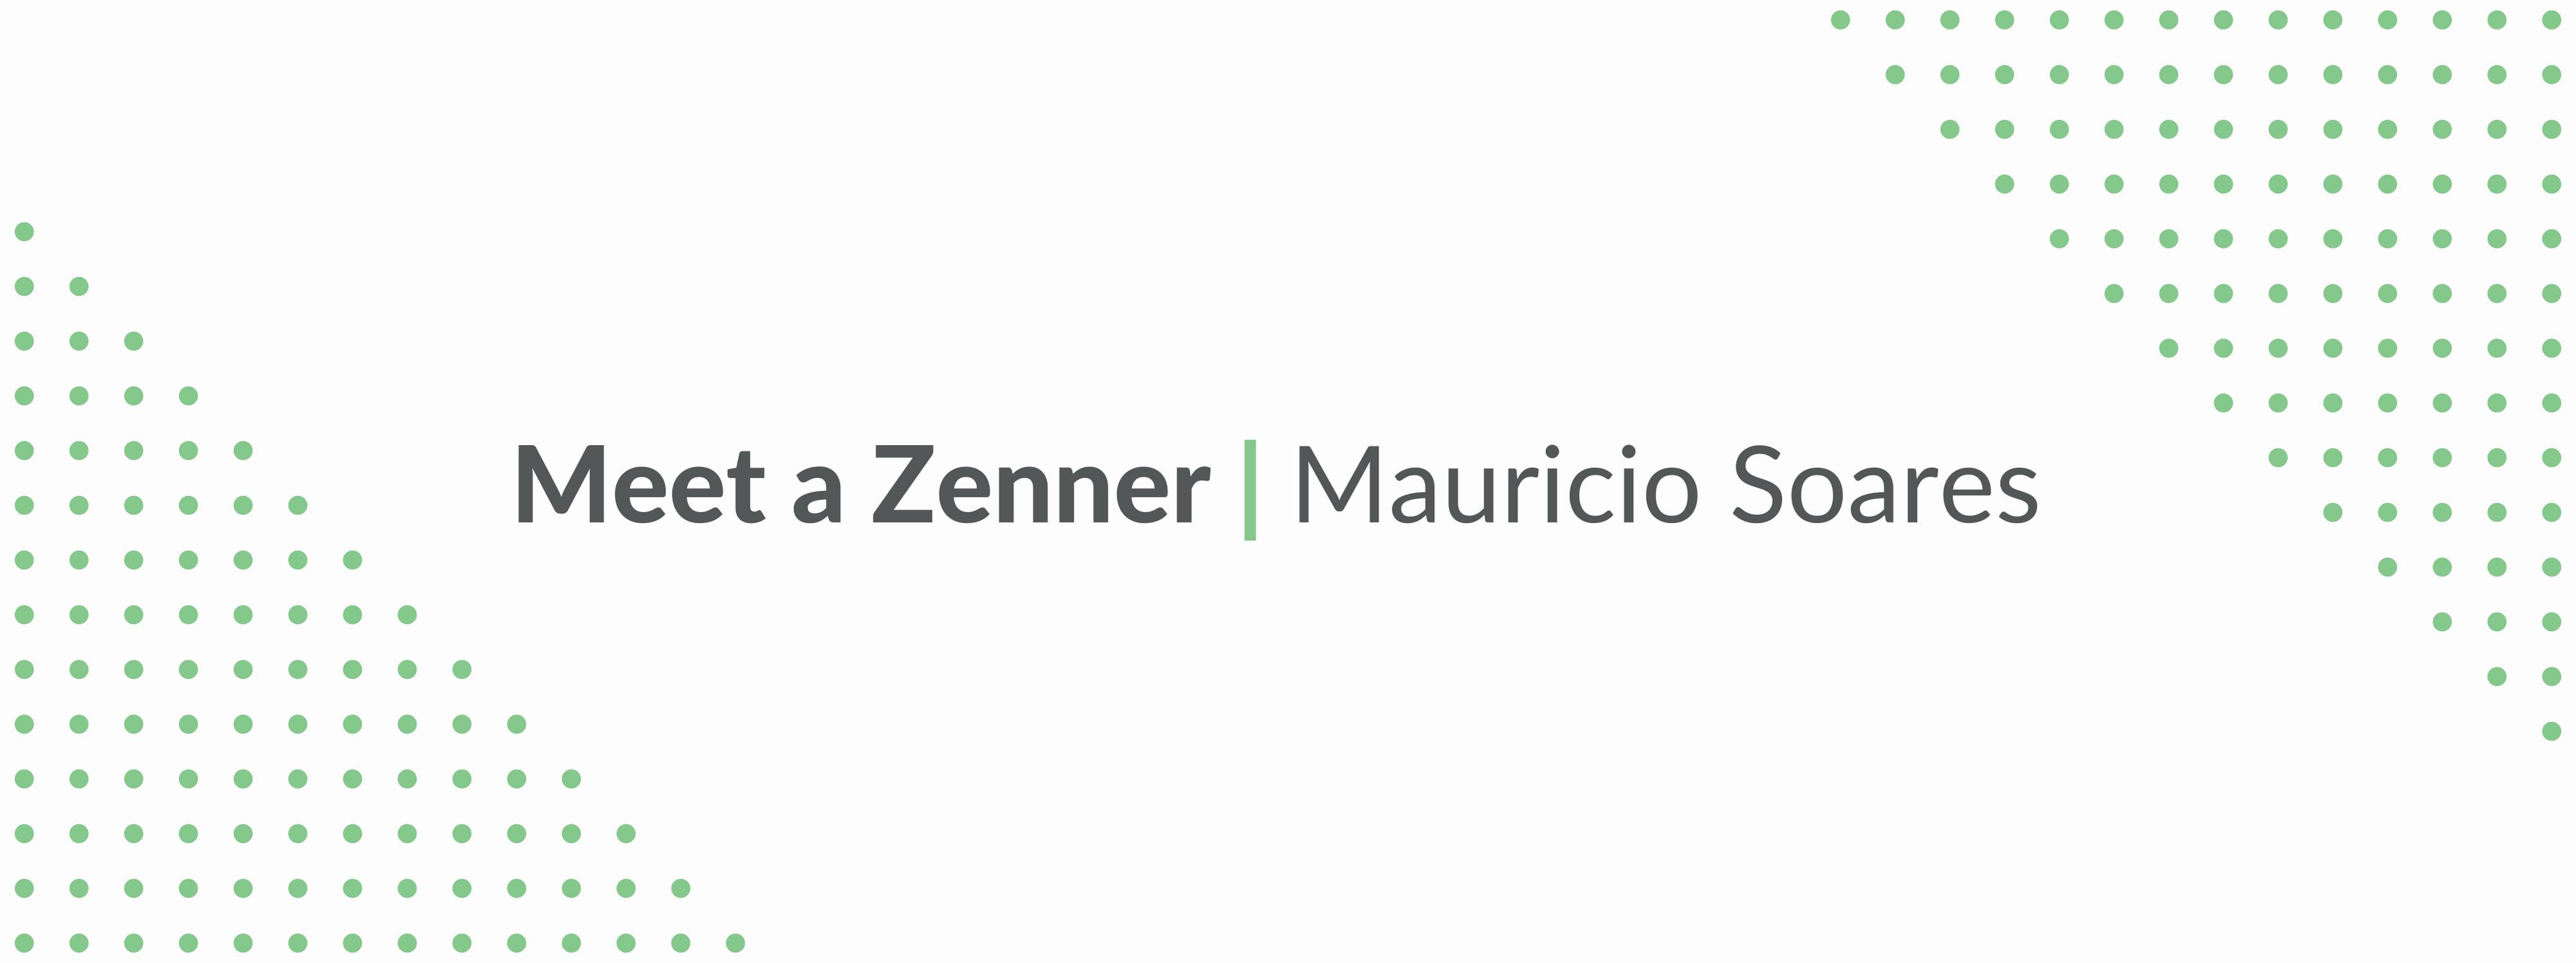 Meet a Zenner: Mauricio Soares